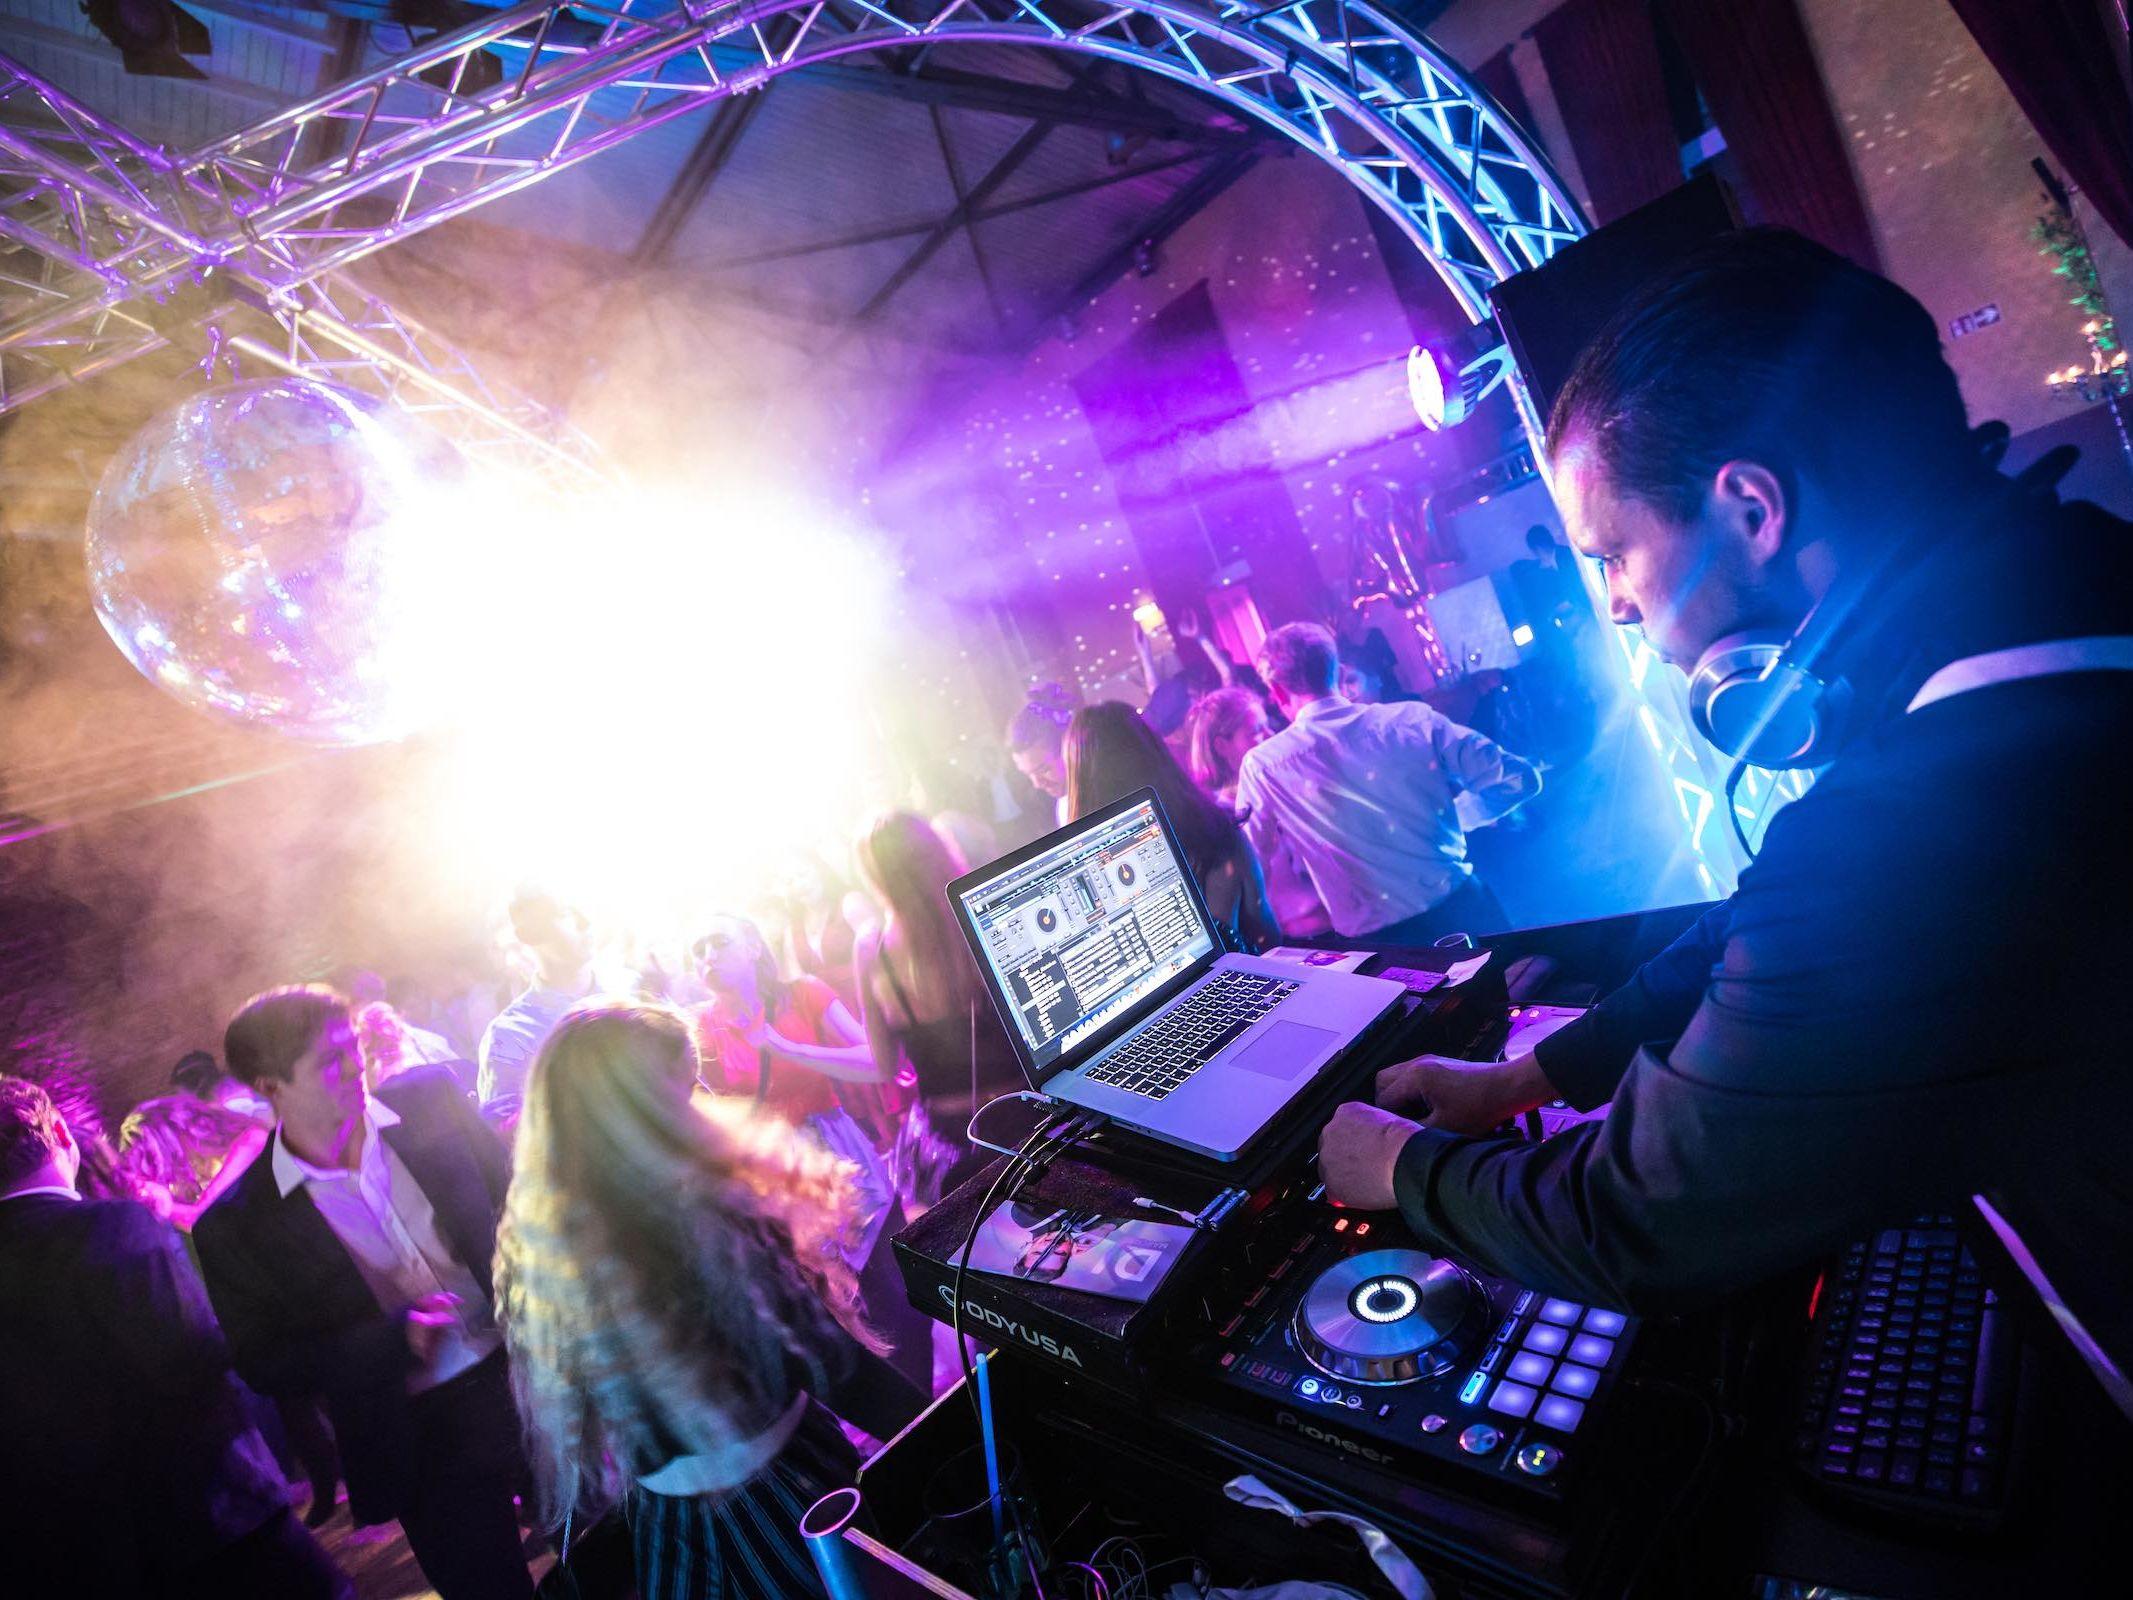 DJ | Abiball | Hannover | Mieten | DJ | Hannover | Marco | Kern | DJ | Hochzeit | Messe | DJ | Event | DJ | Geburtstag | DJ | Betriebsfeier | DJ | Buchen | Discjockey | Mieten | DJ | Agentur | DJ | HCC | Lehmann | Eventservice